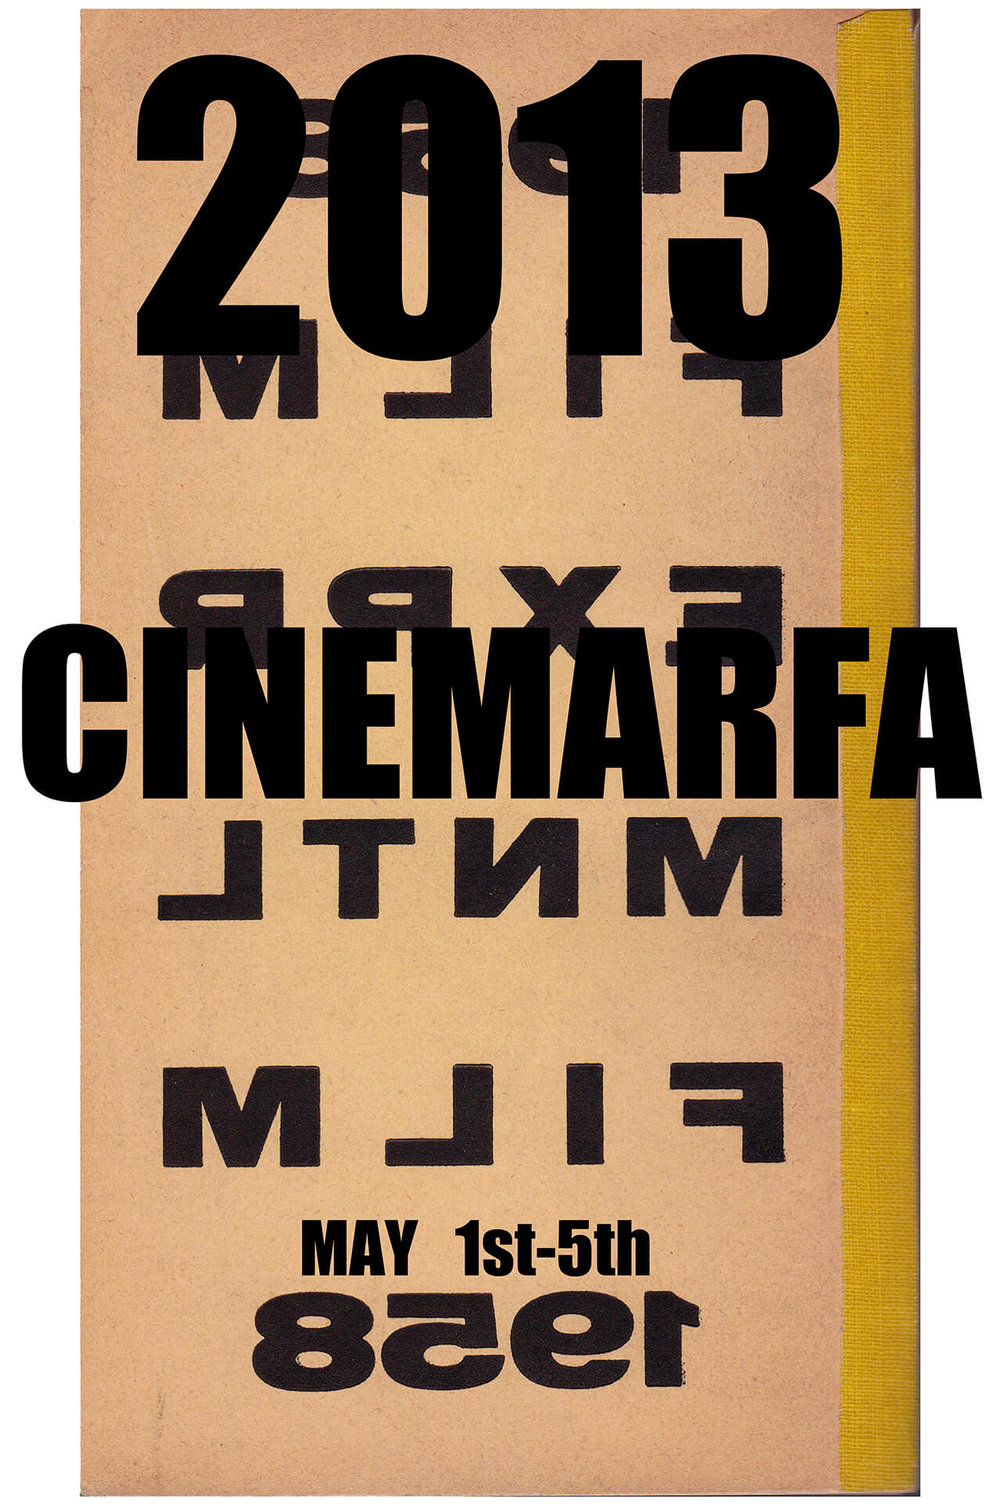 CineMarfa-2013-Poster.jpg